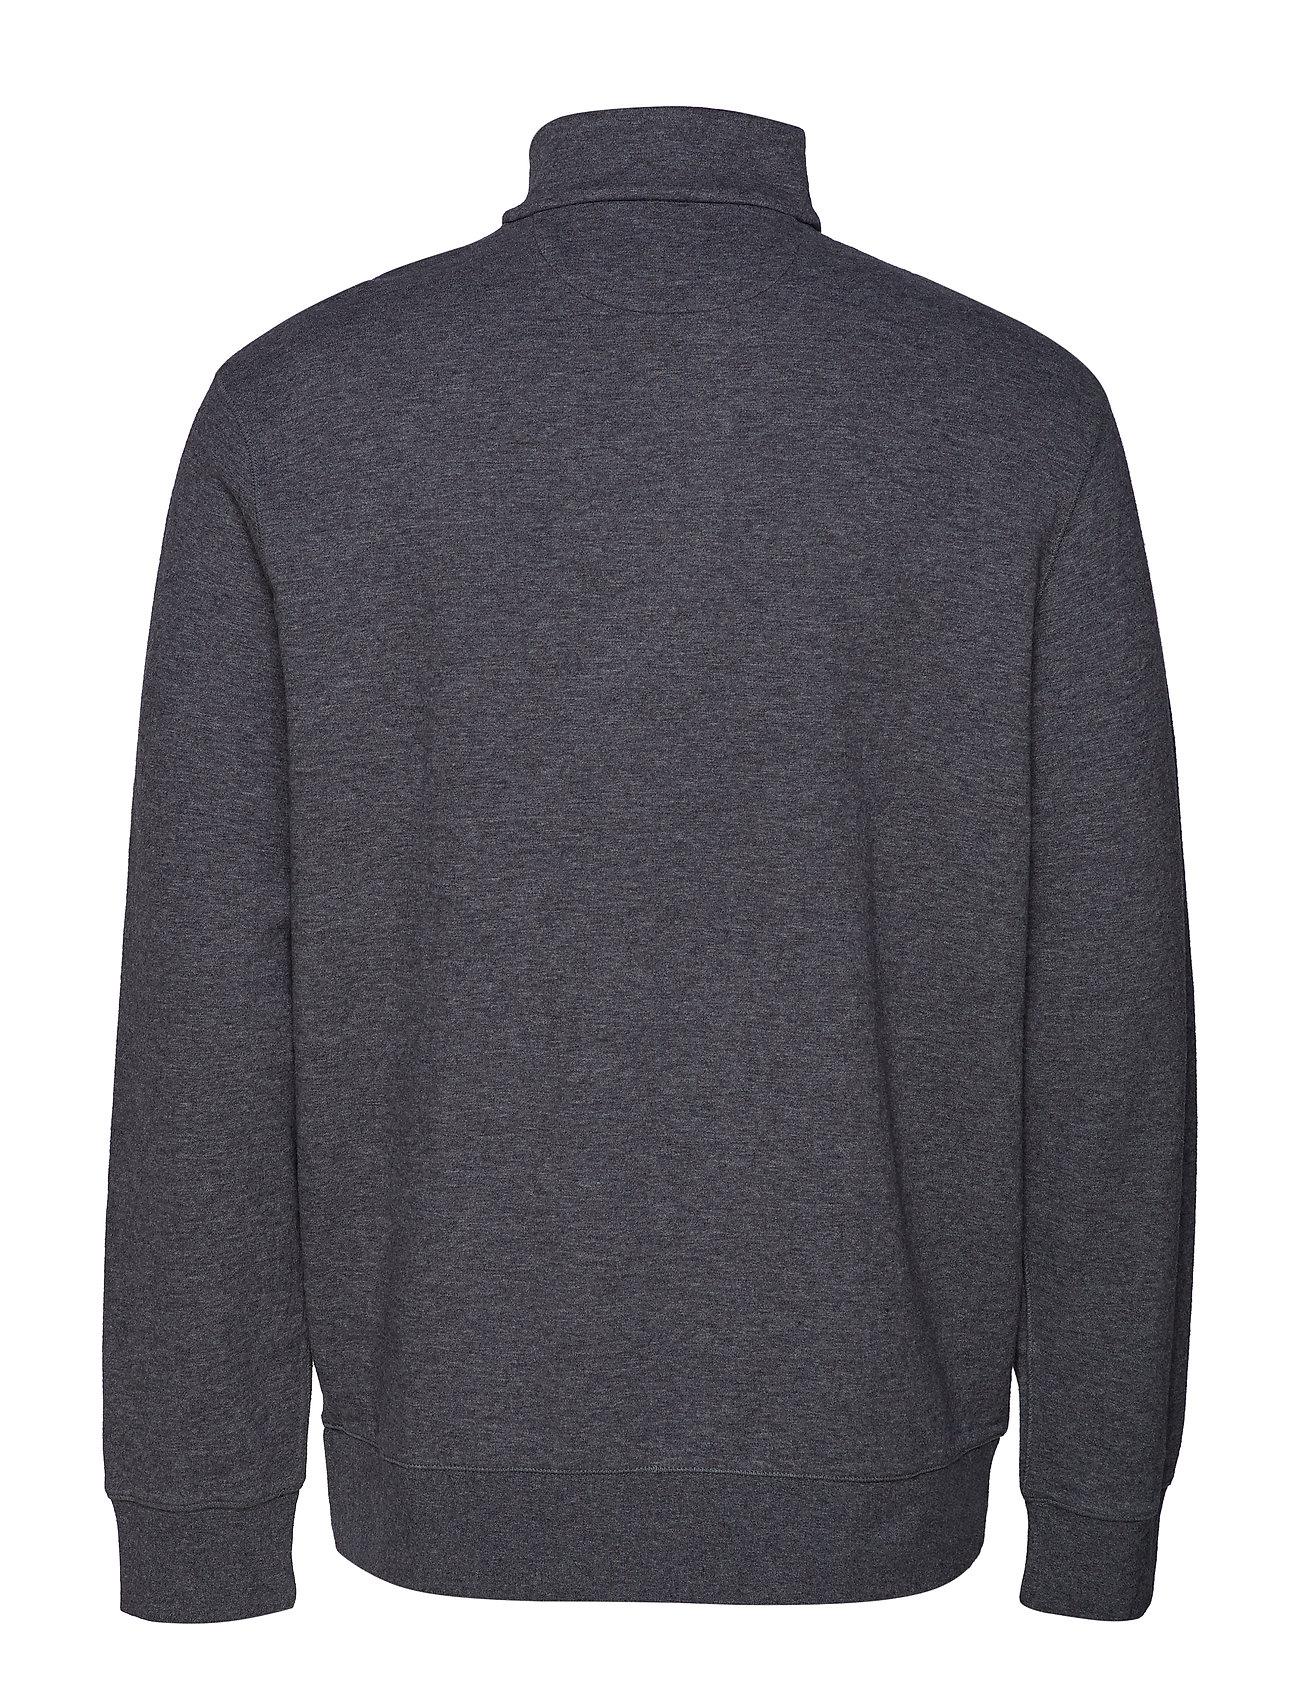 knitmedium Ralph HePolo Lauren Lshzm1 Sleeve Flannel long AjRqS5c4L3